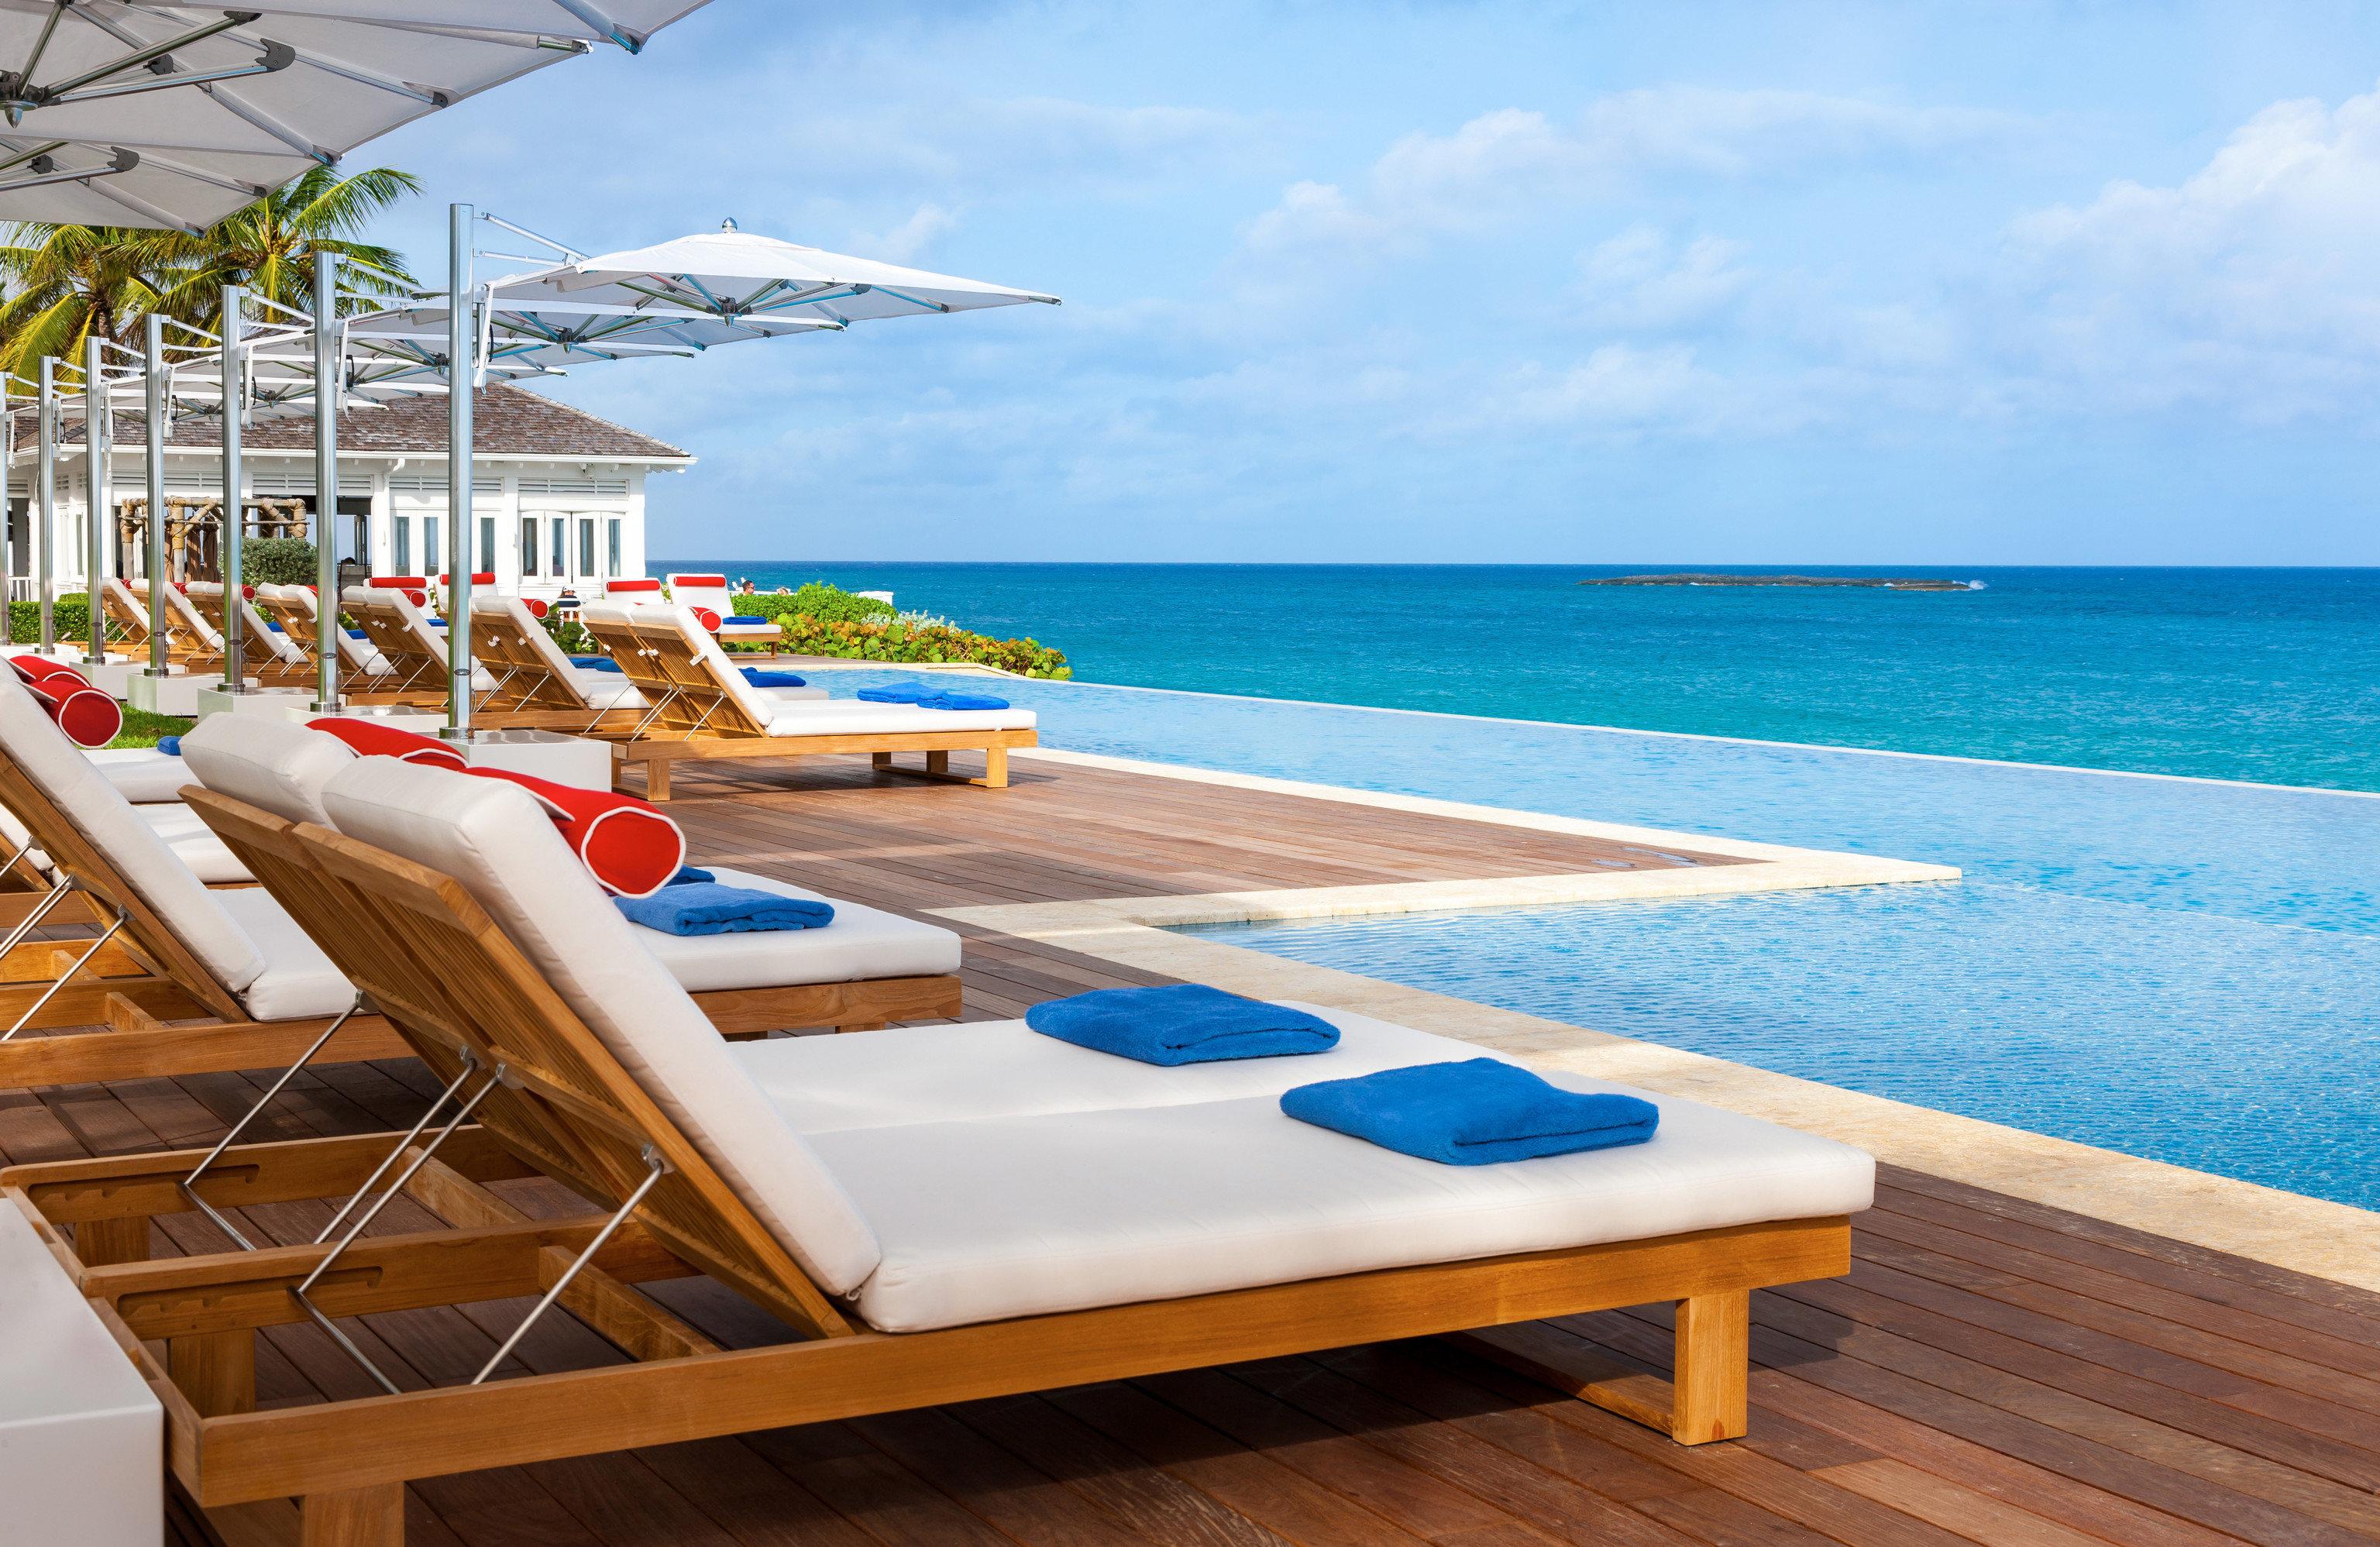 Hotels Romance Trip Ideas sky water chair leisure Beach property swimming pool caribbean Resort Ocean Sea Villa Deck